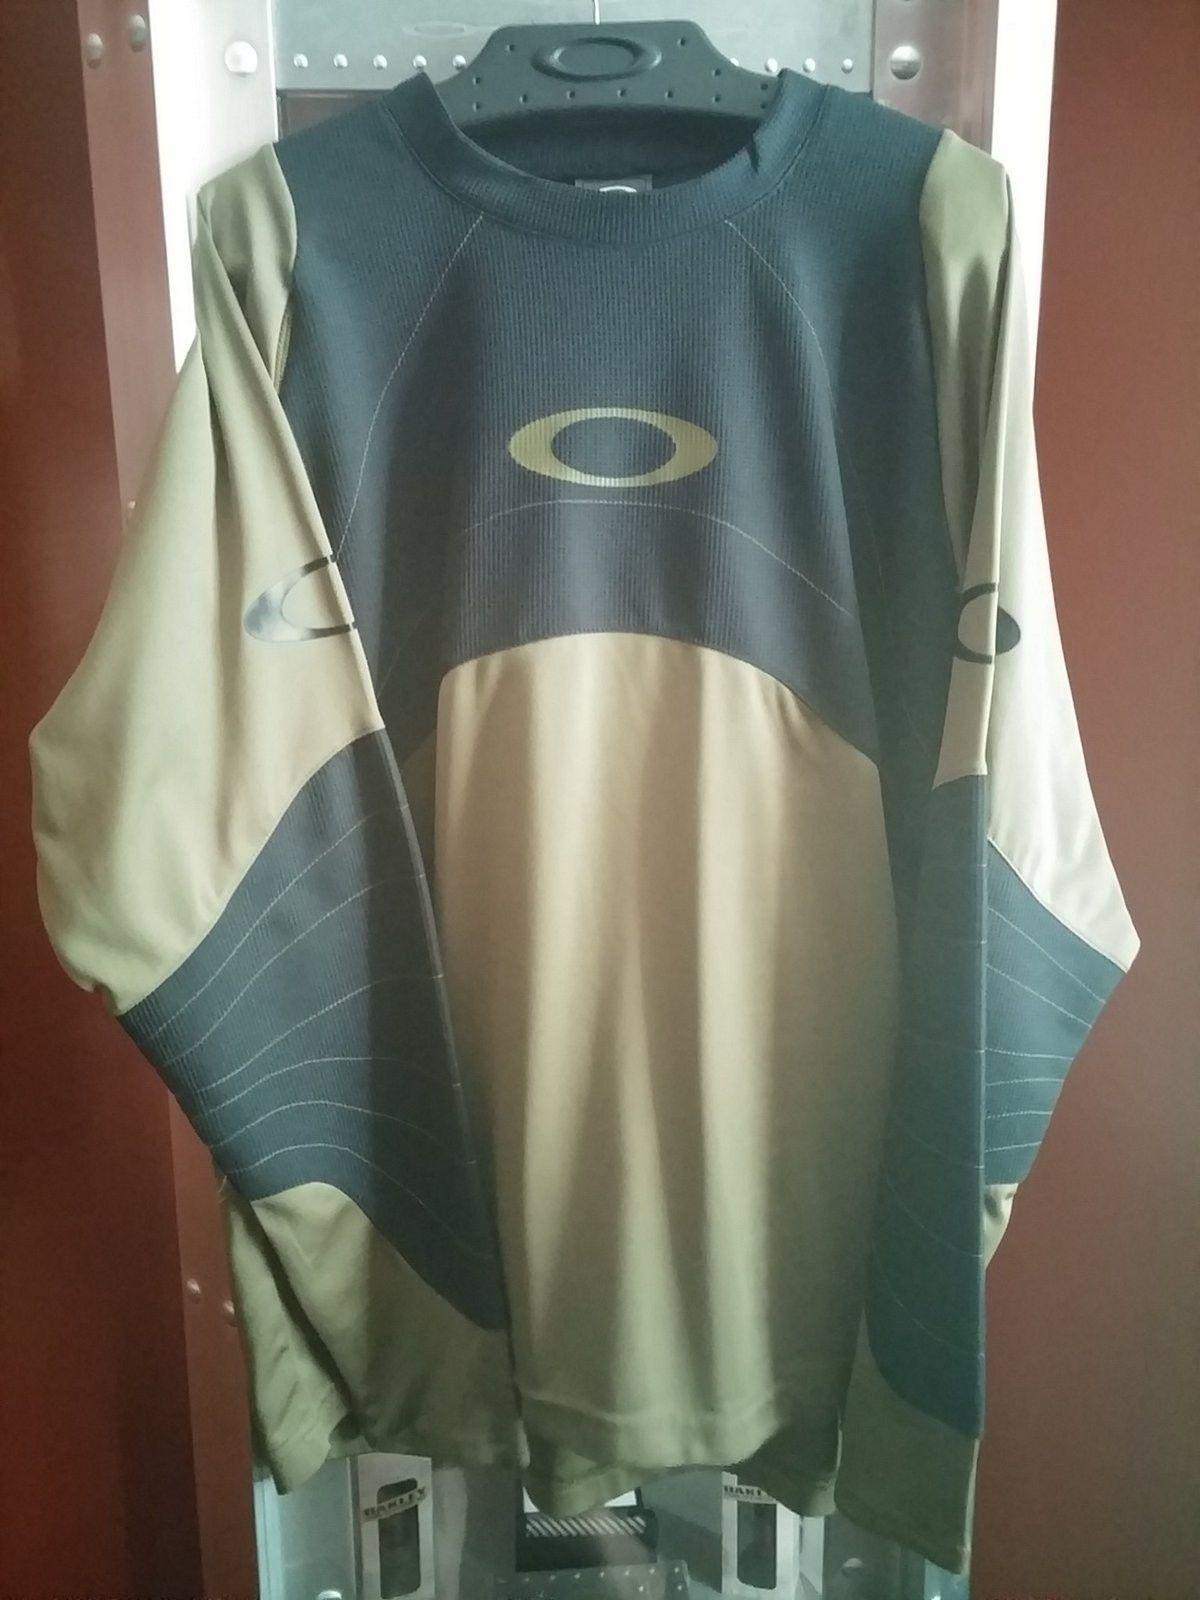 Oakley MTB Jerseys. - 20150118_091224.jpg